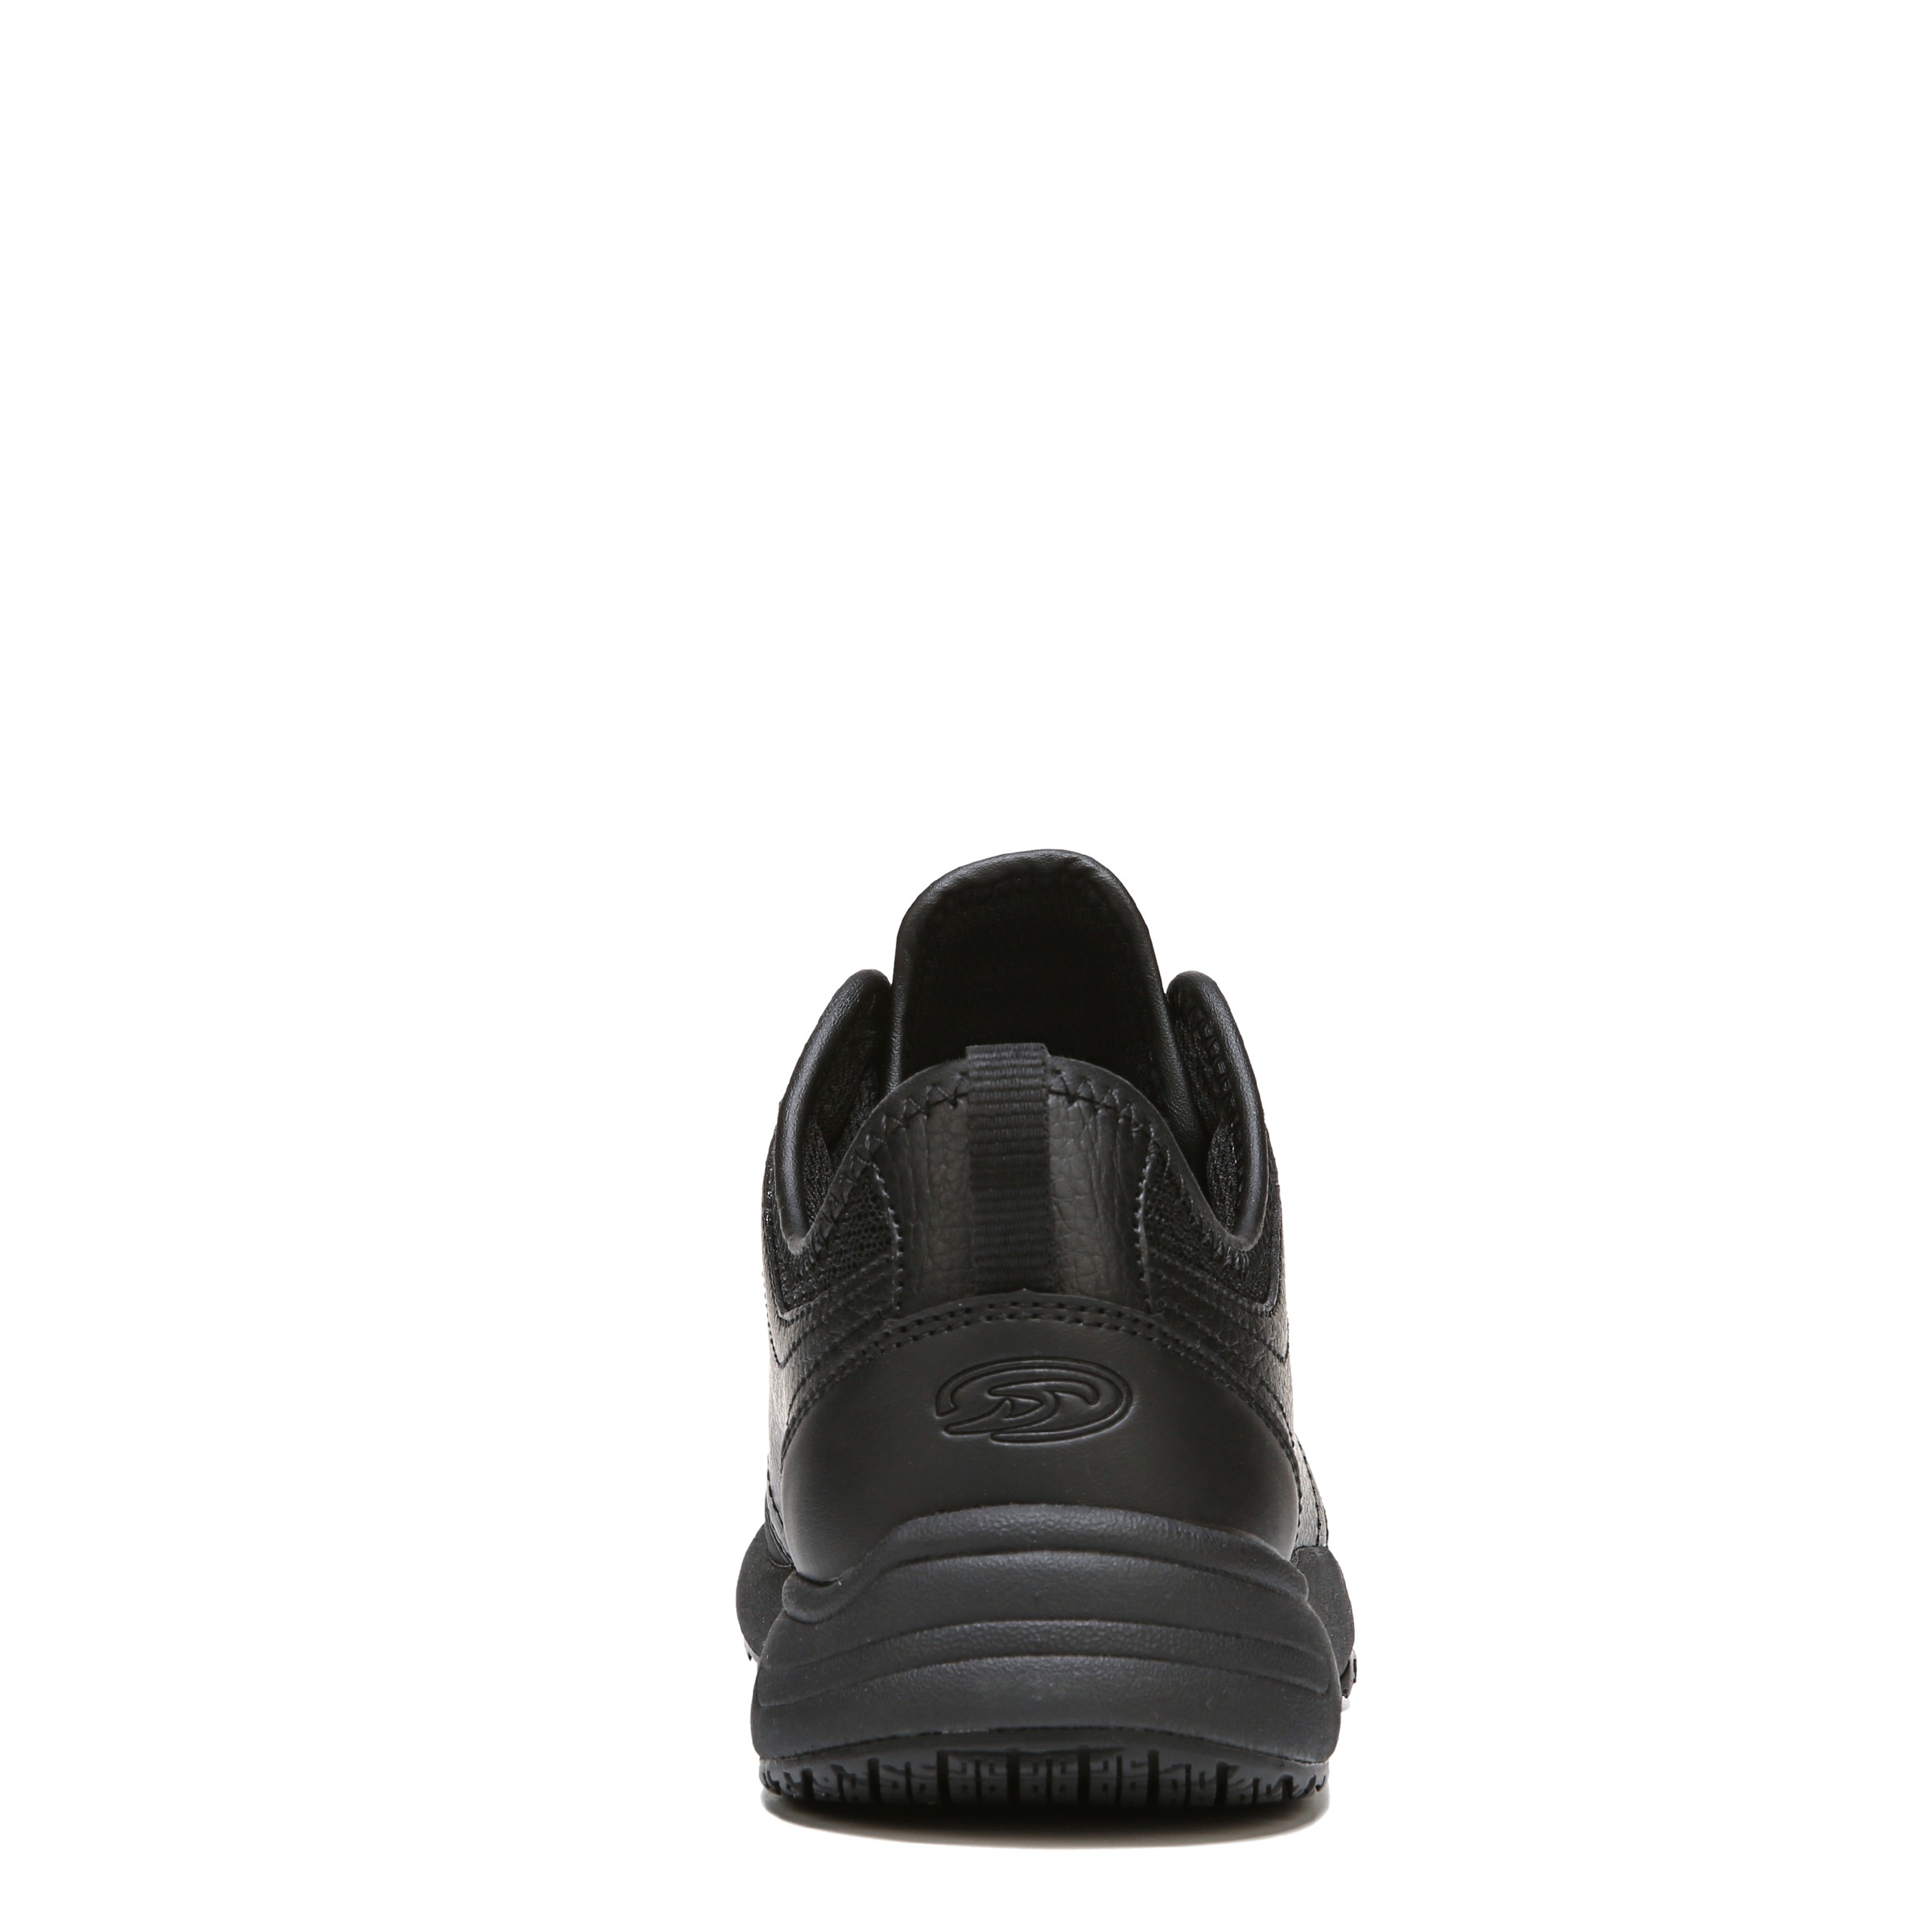 a331300f263 Dr. Scholl s Drive Women s Slip Resistant Black Athletic Work Shoe ...